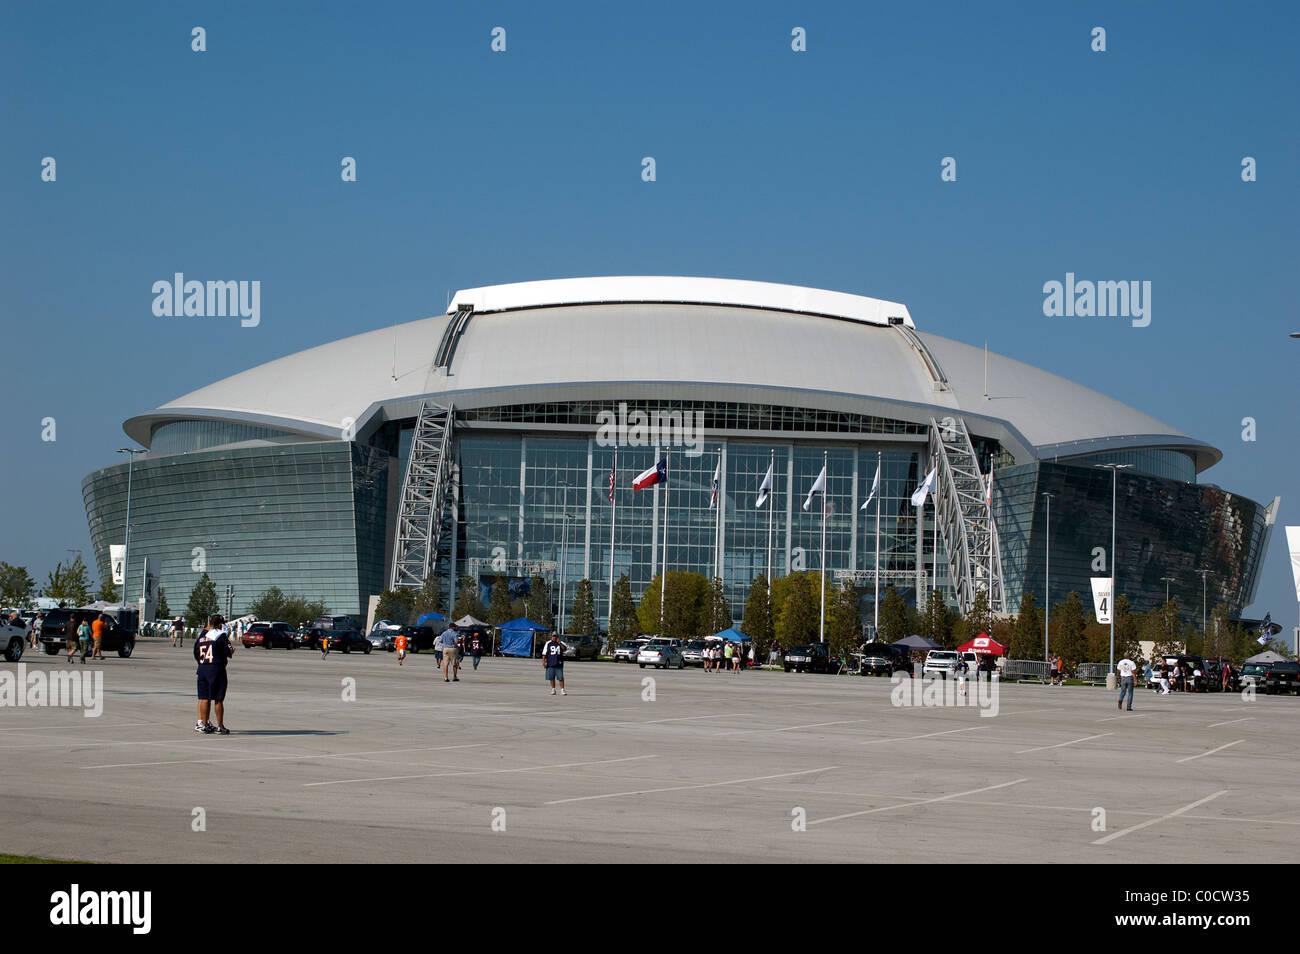 Hotels By Dallas Cowboys Stadium Arlington Tx